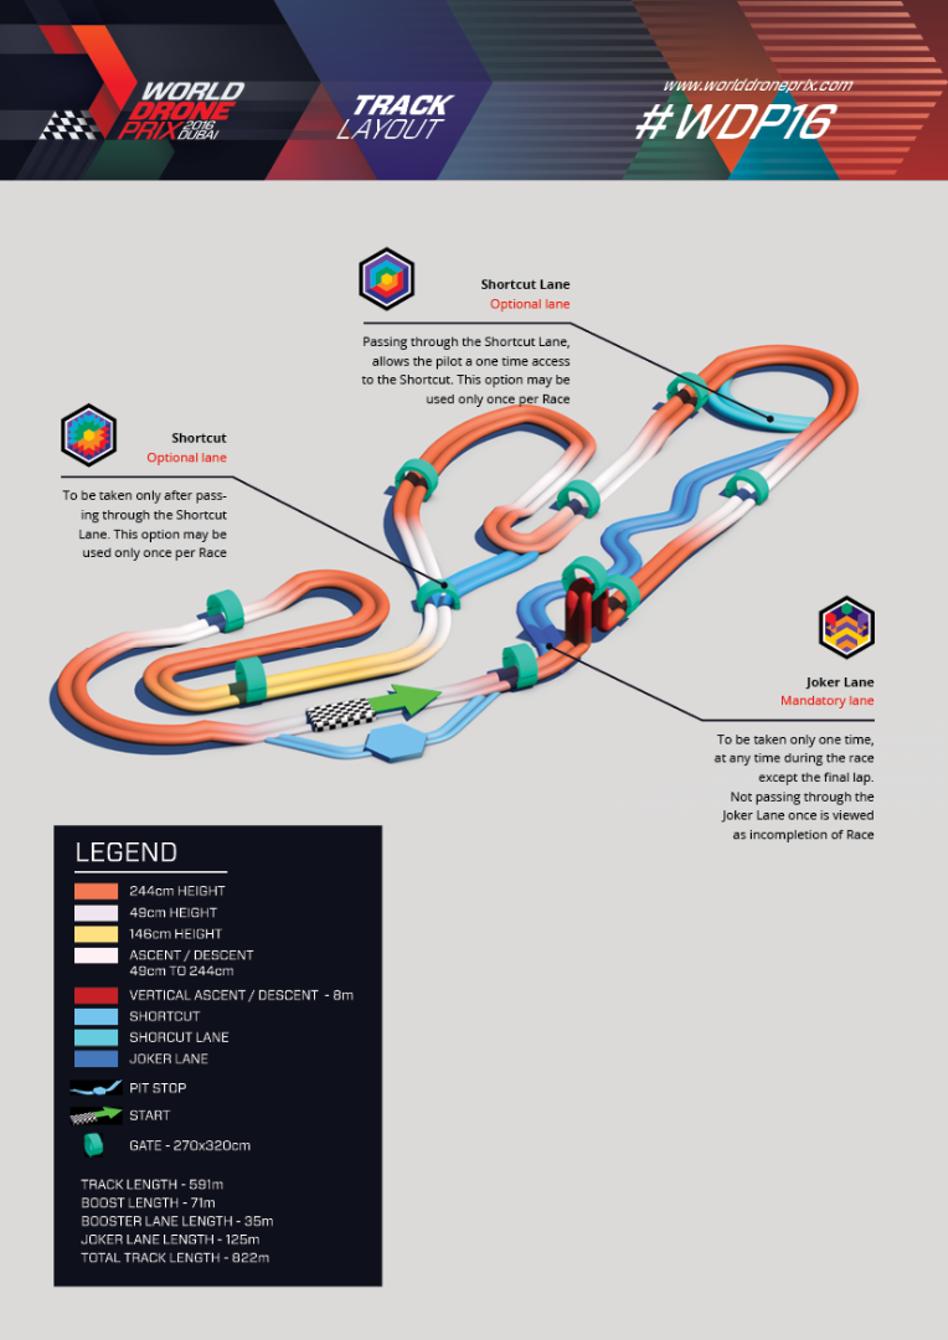 Track layout for the World Drone Prix in Dubai. Credit: worlddroneprix.com